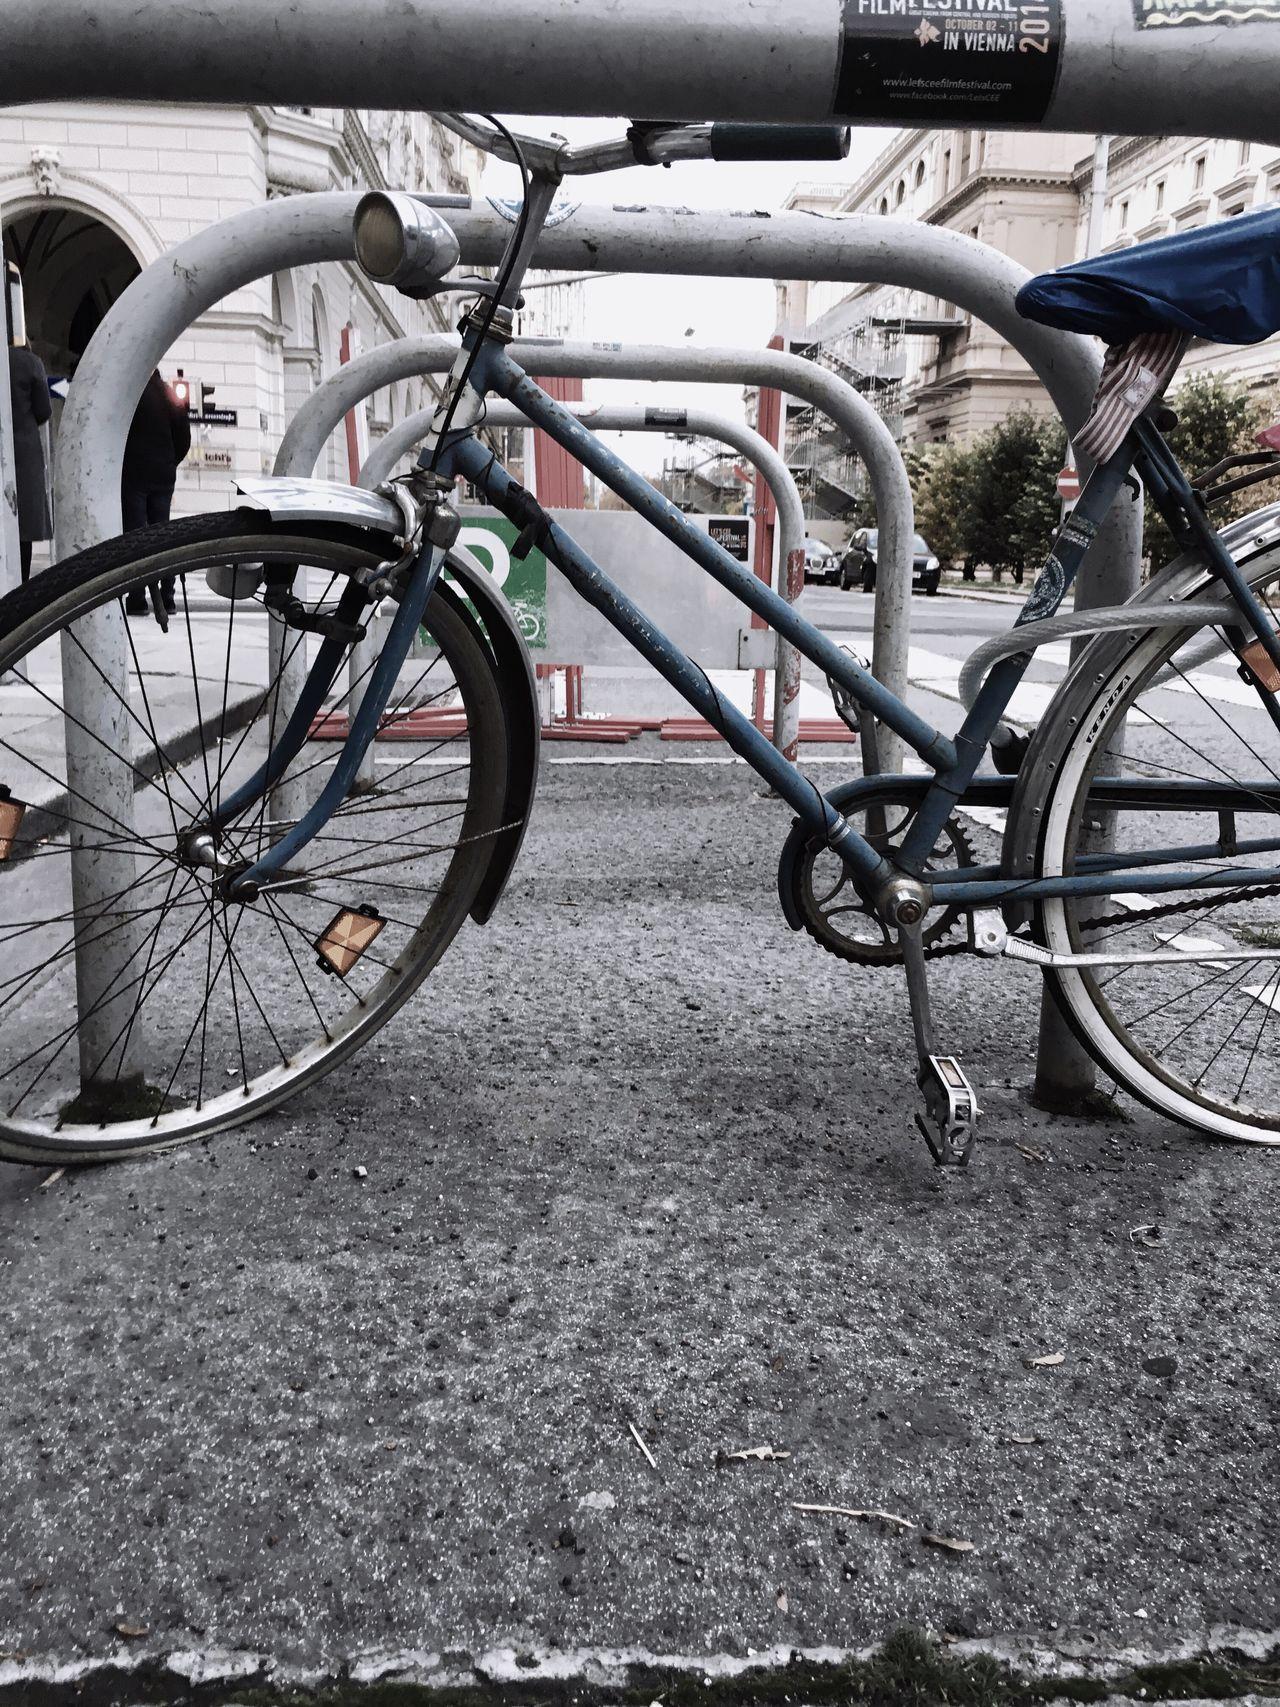 Bicycle Wheel Bicycle Rack Street Photography